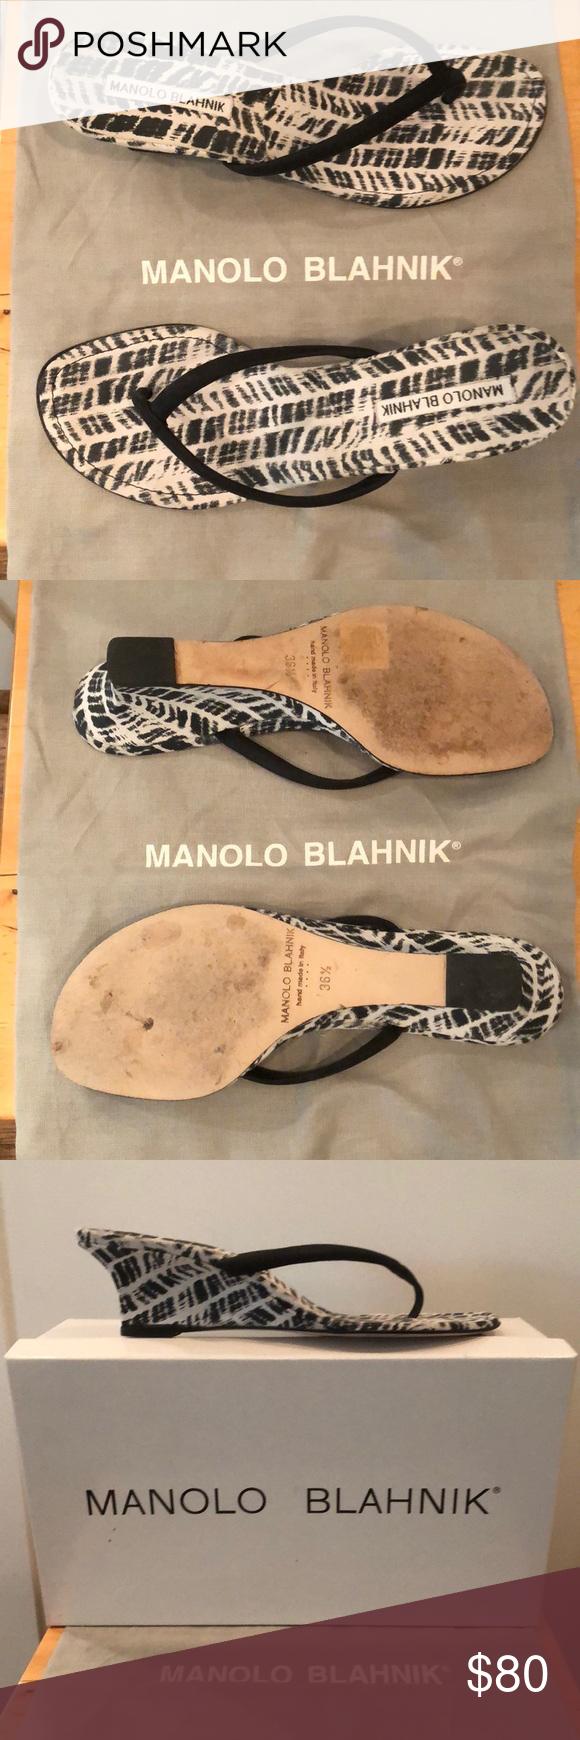 087b3b58ed2e05 Manolo Blahnik Wedge Sandal